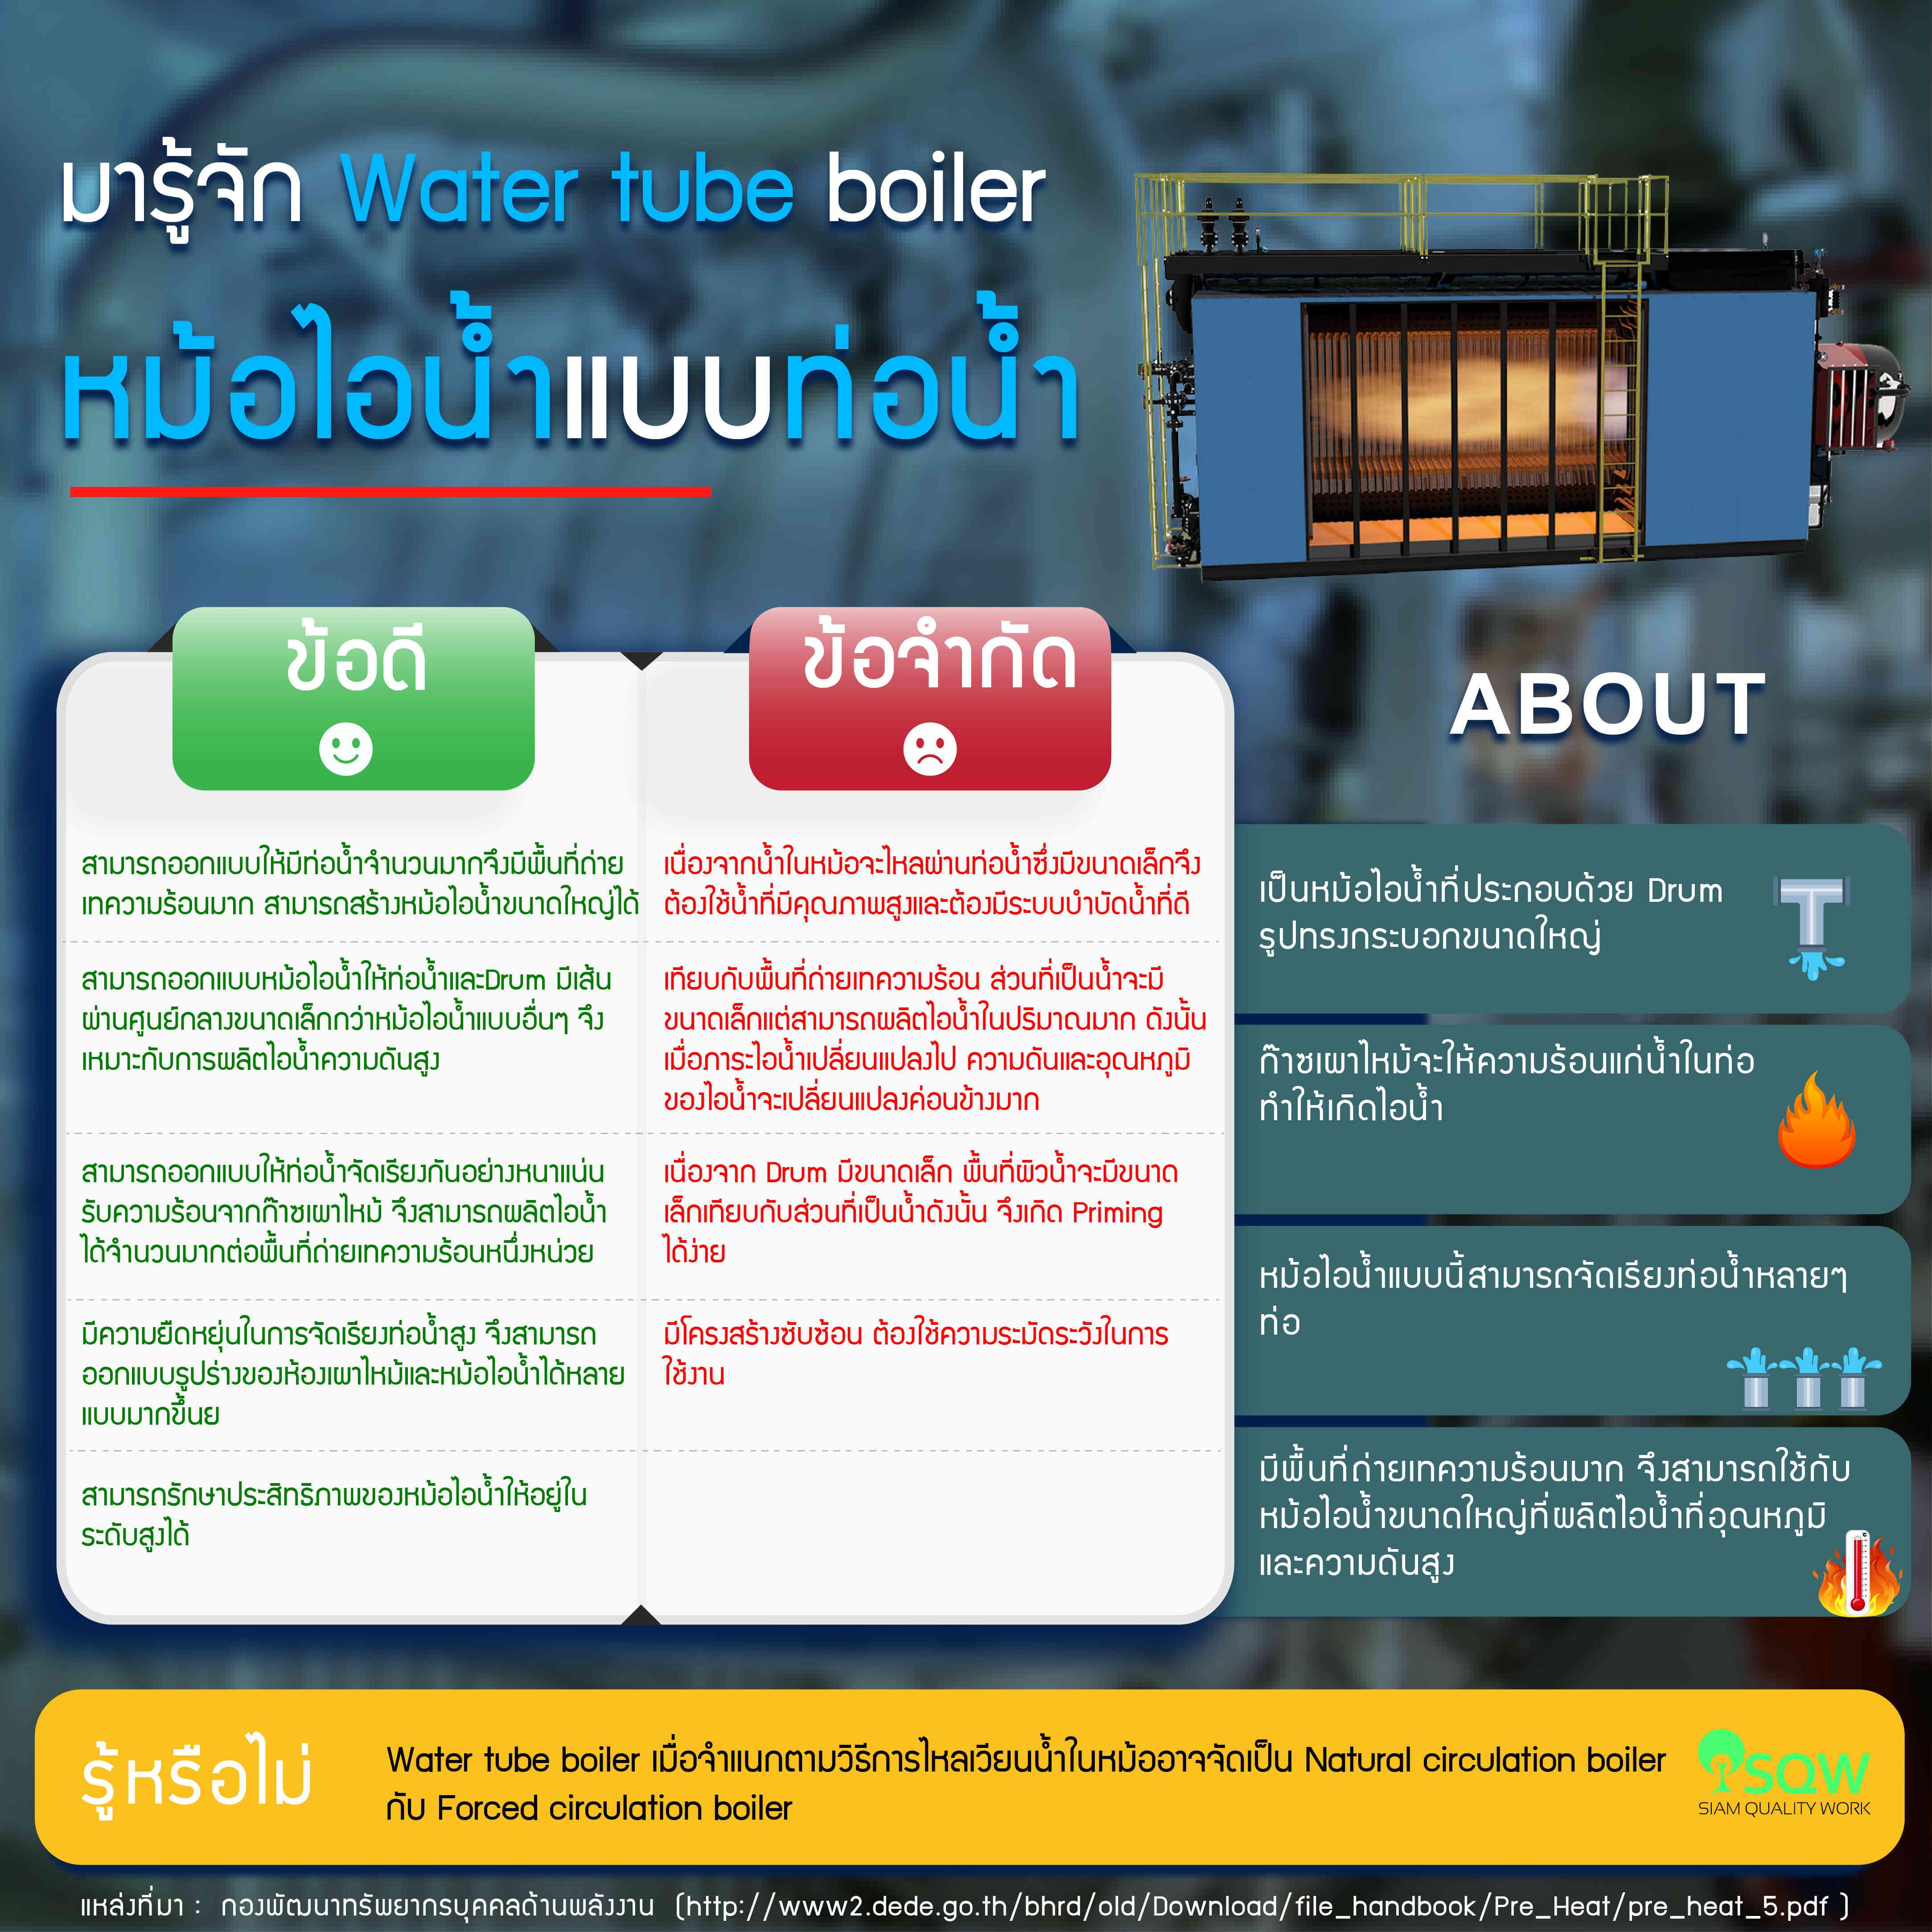 Water Tube Boiler  หม้อไอน้ำแบบท่อน้ำ